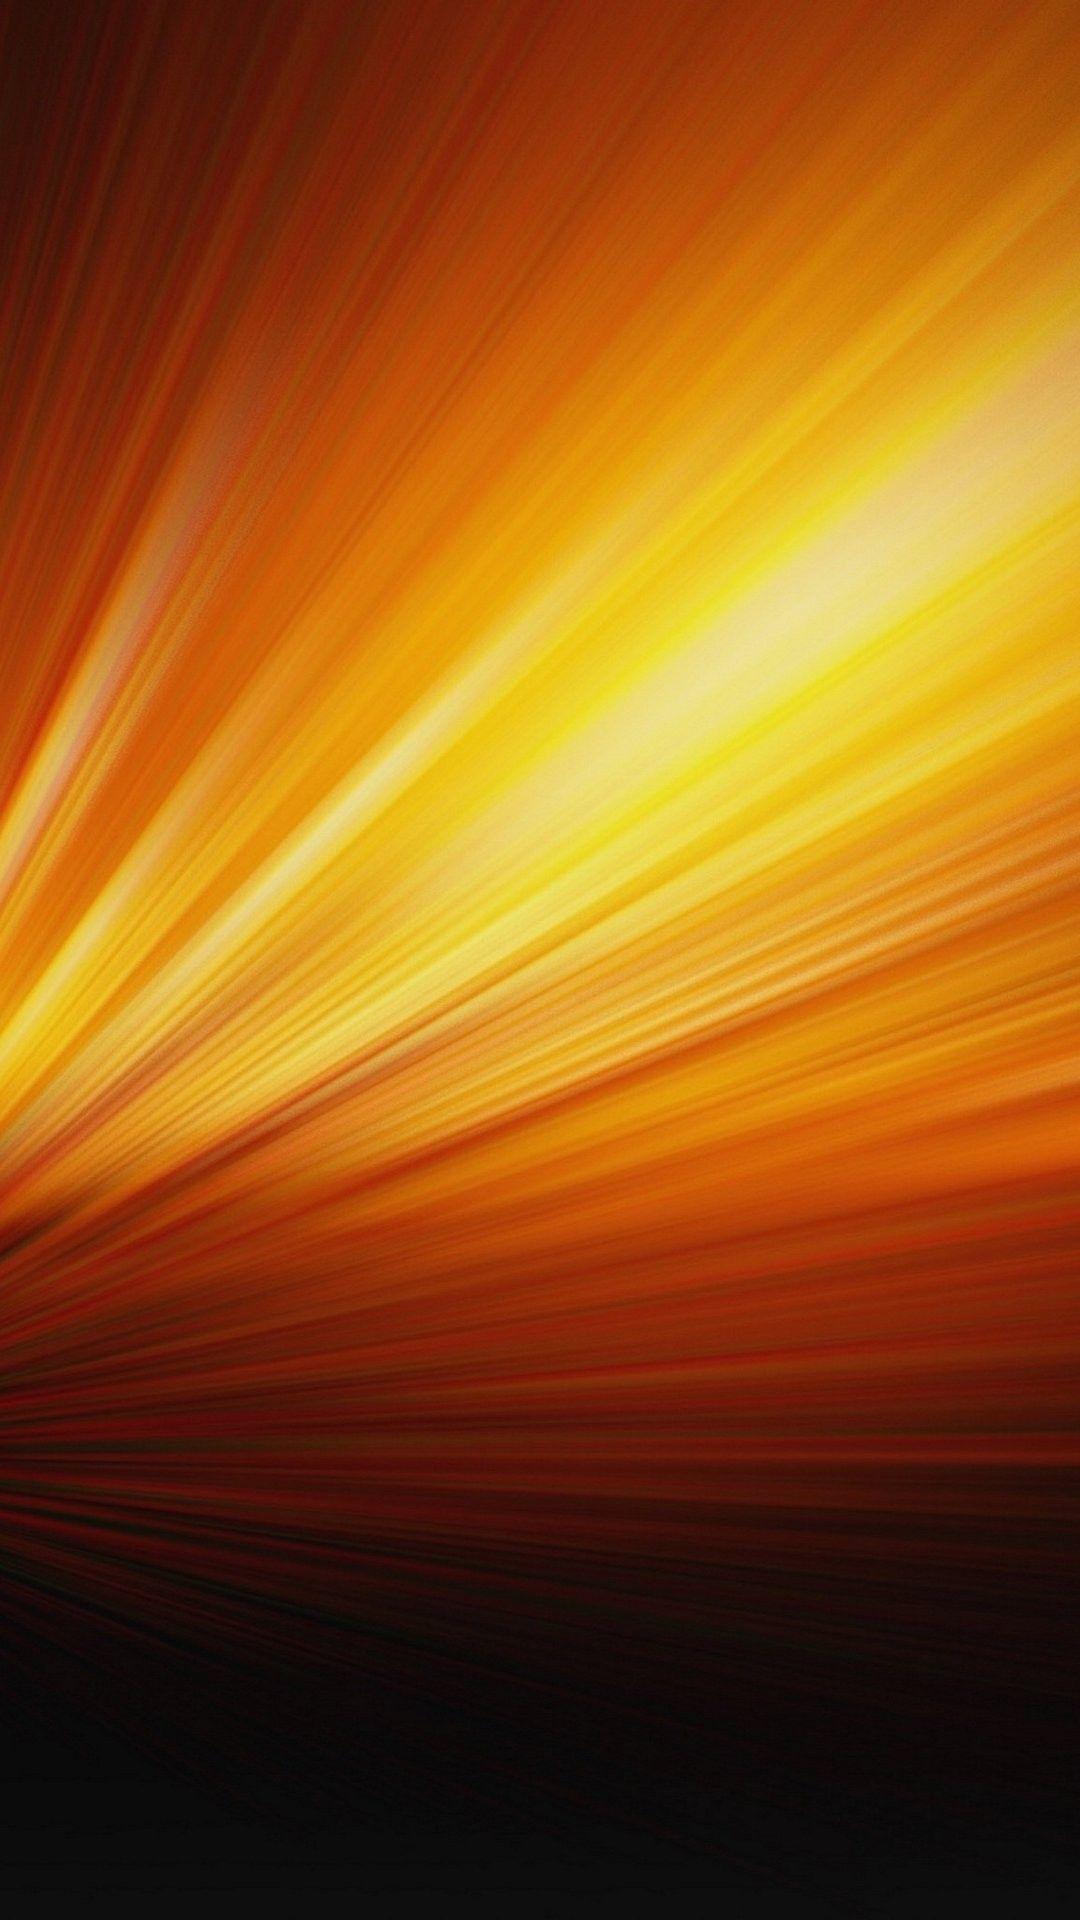 iPhone Orange Wallpapers - Wallpaper Cave